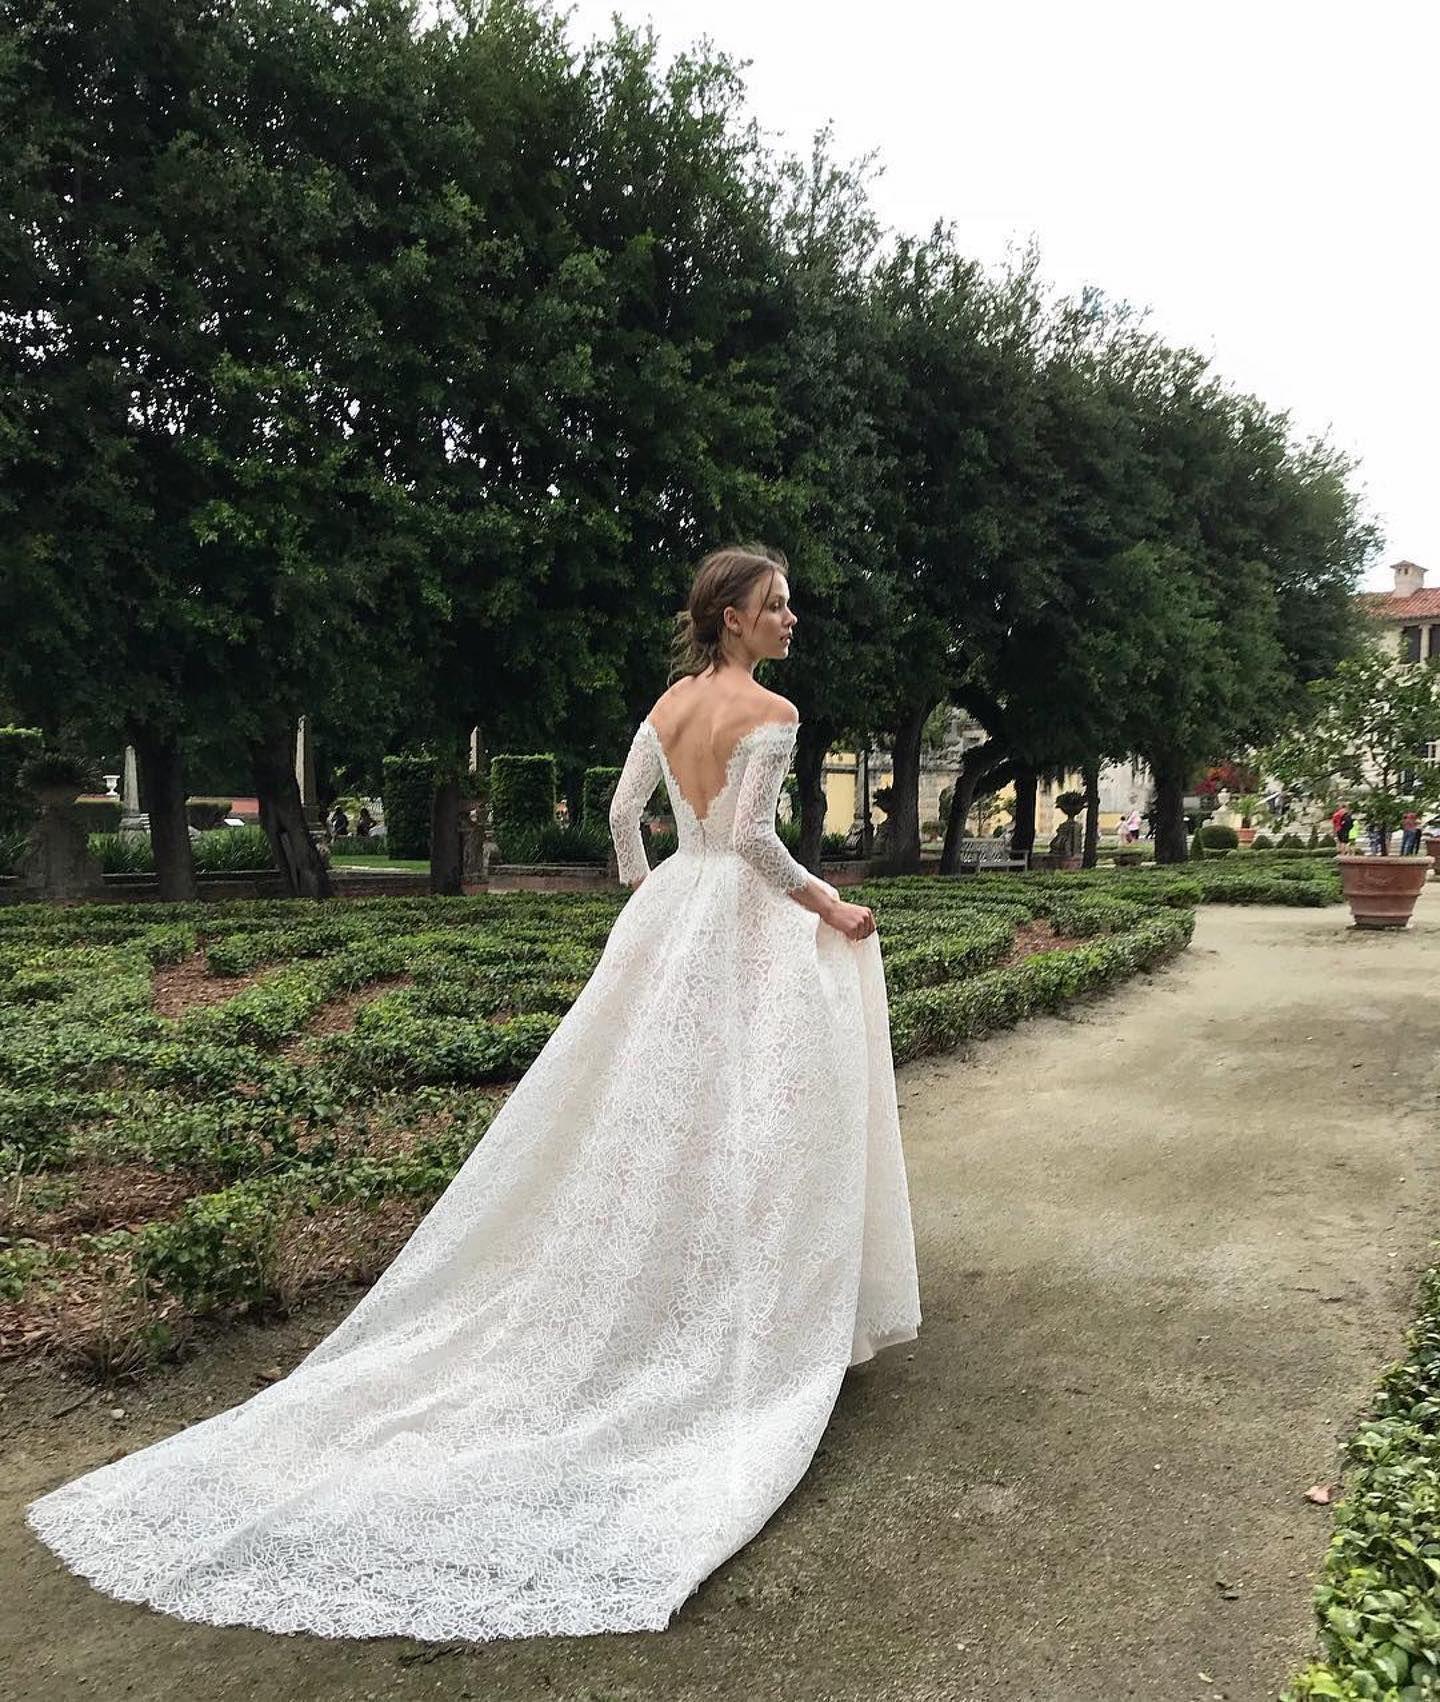 New In Lovely By Moniquelhuillierbride Isn T She Lovely Moni Cheap Wedding Dress Long Sleeve Wedding Dress Lace Monique Lhuillier Wedding Dress [ 1702 x 1440 Pixel ]